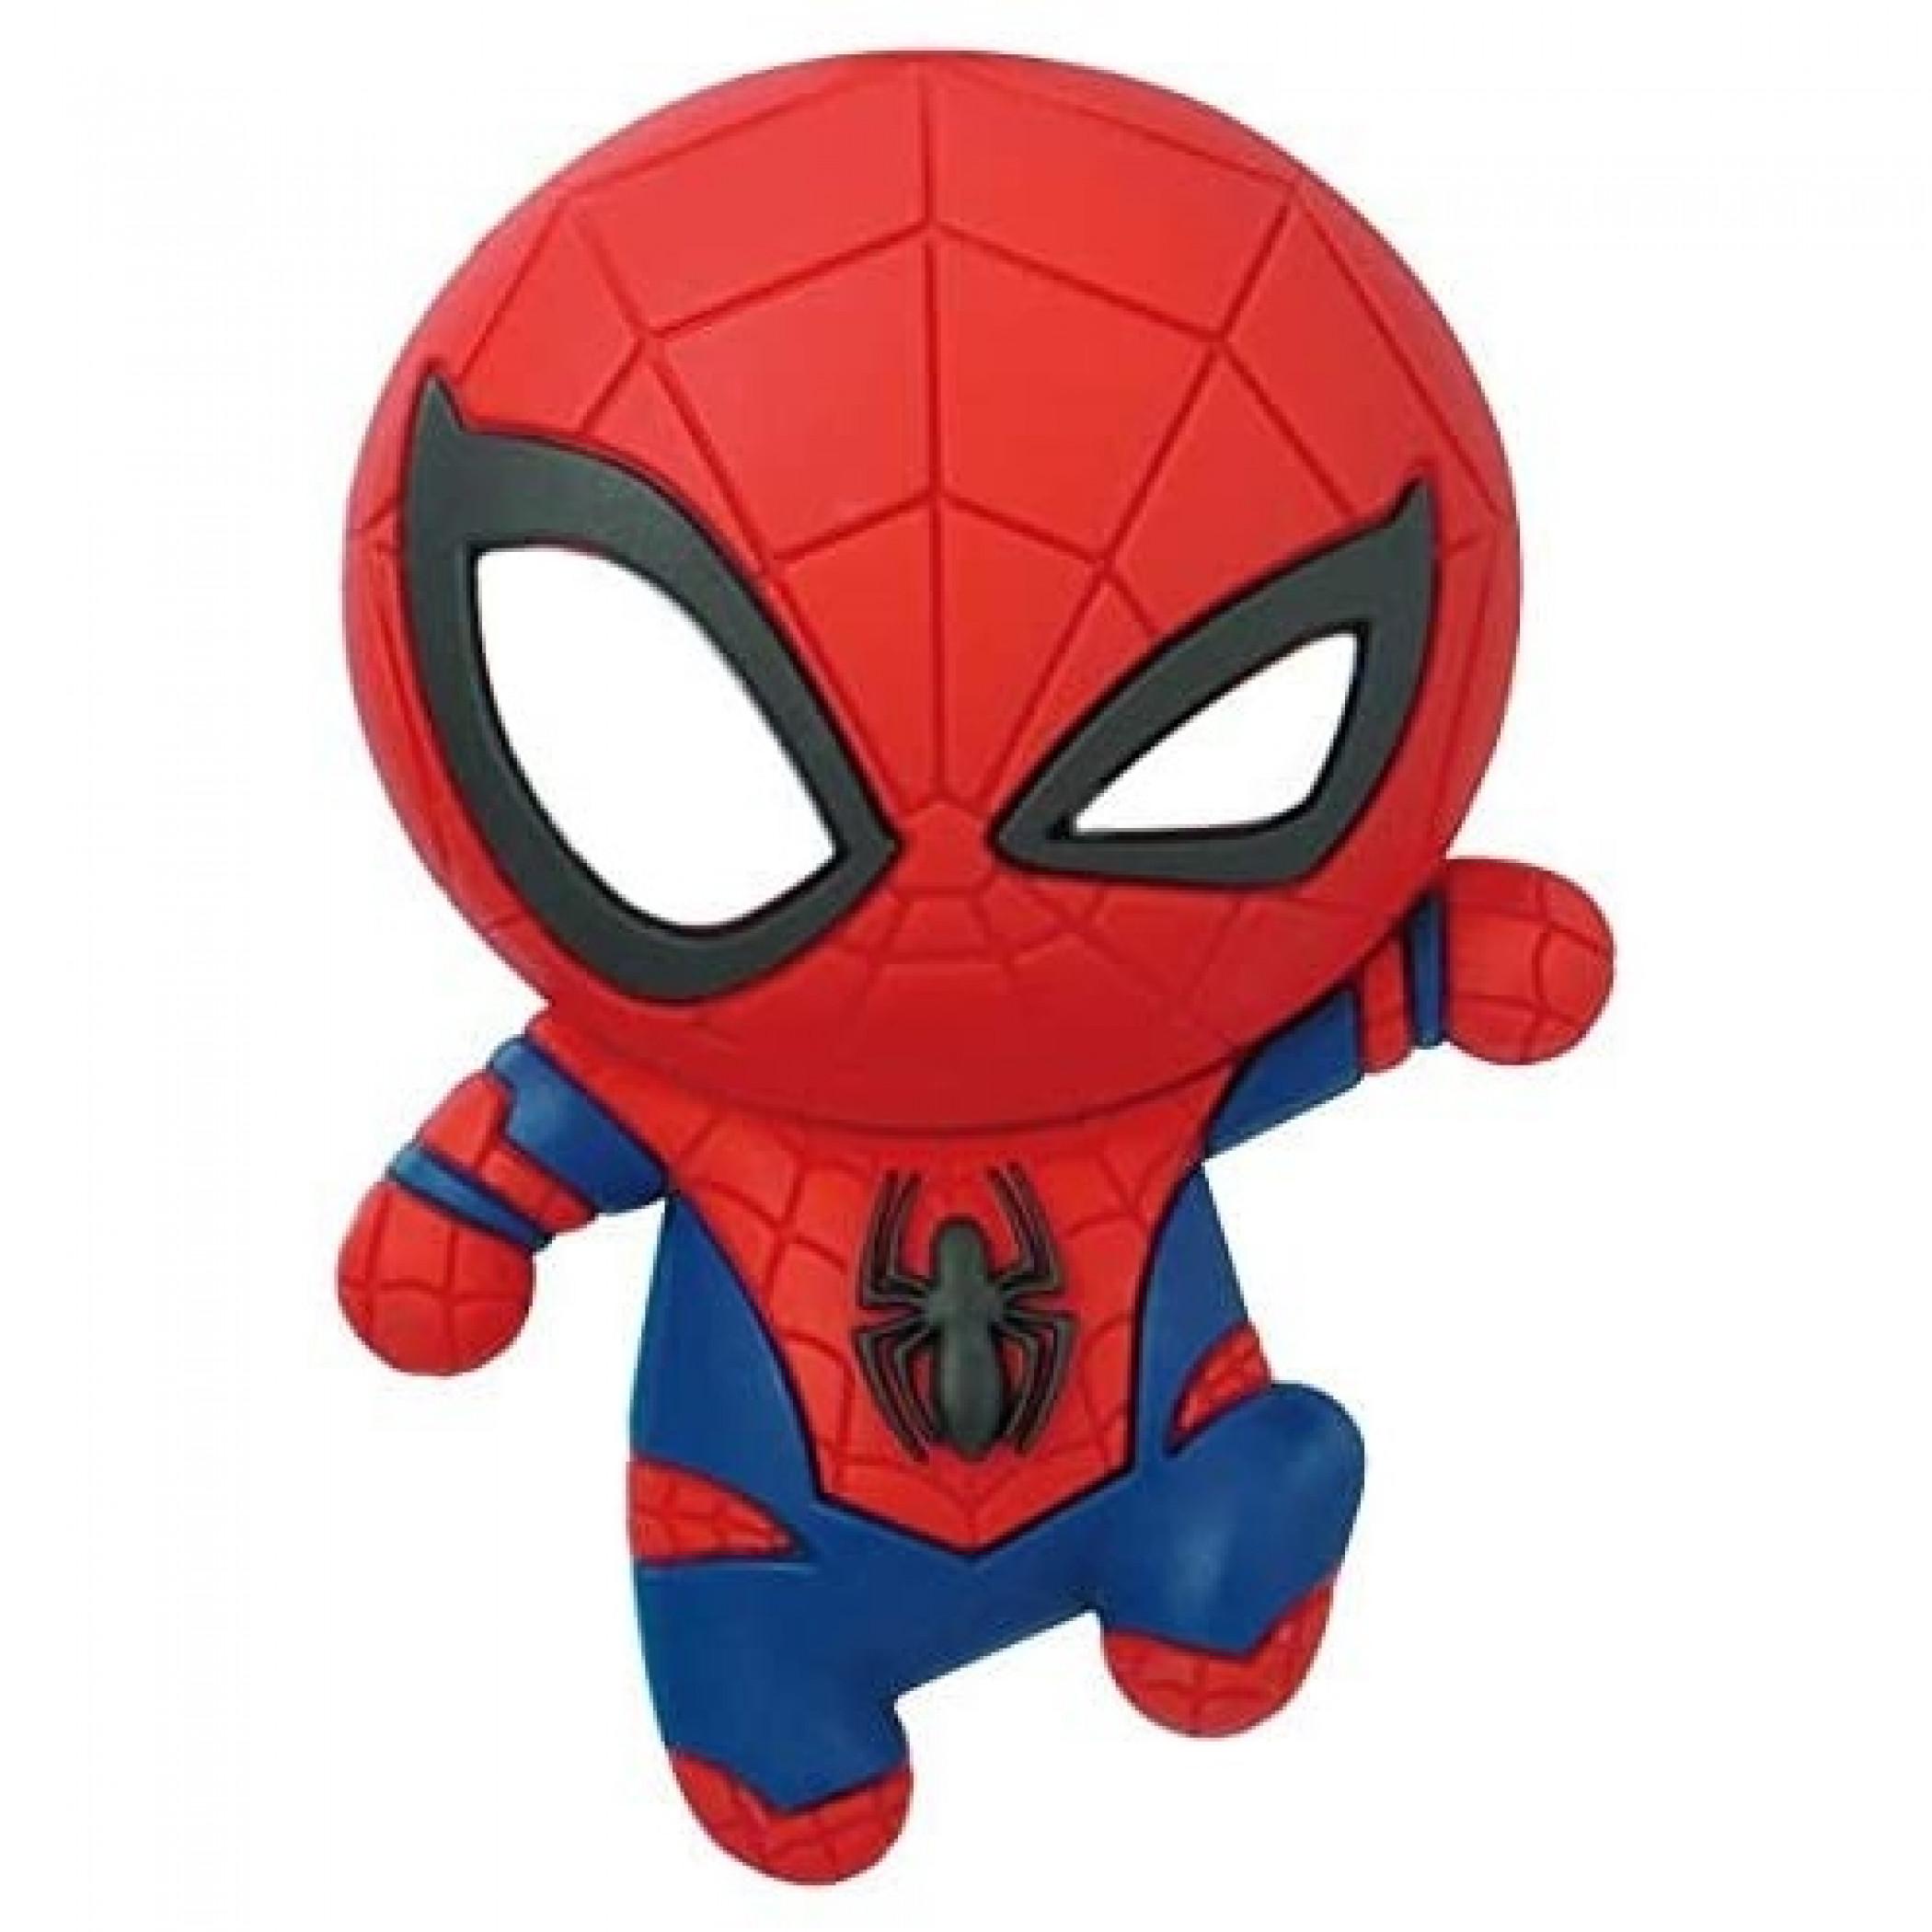 Marvel Comics Spider-Man Costume 3D Foam Magnet